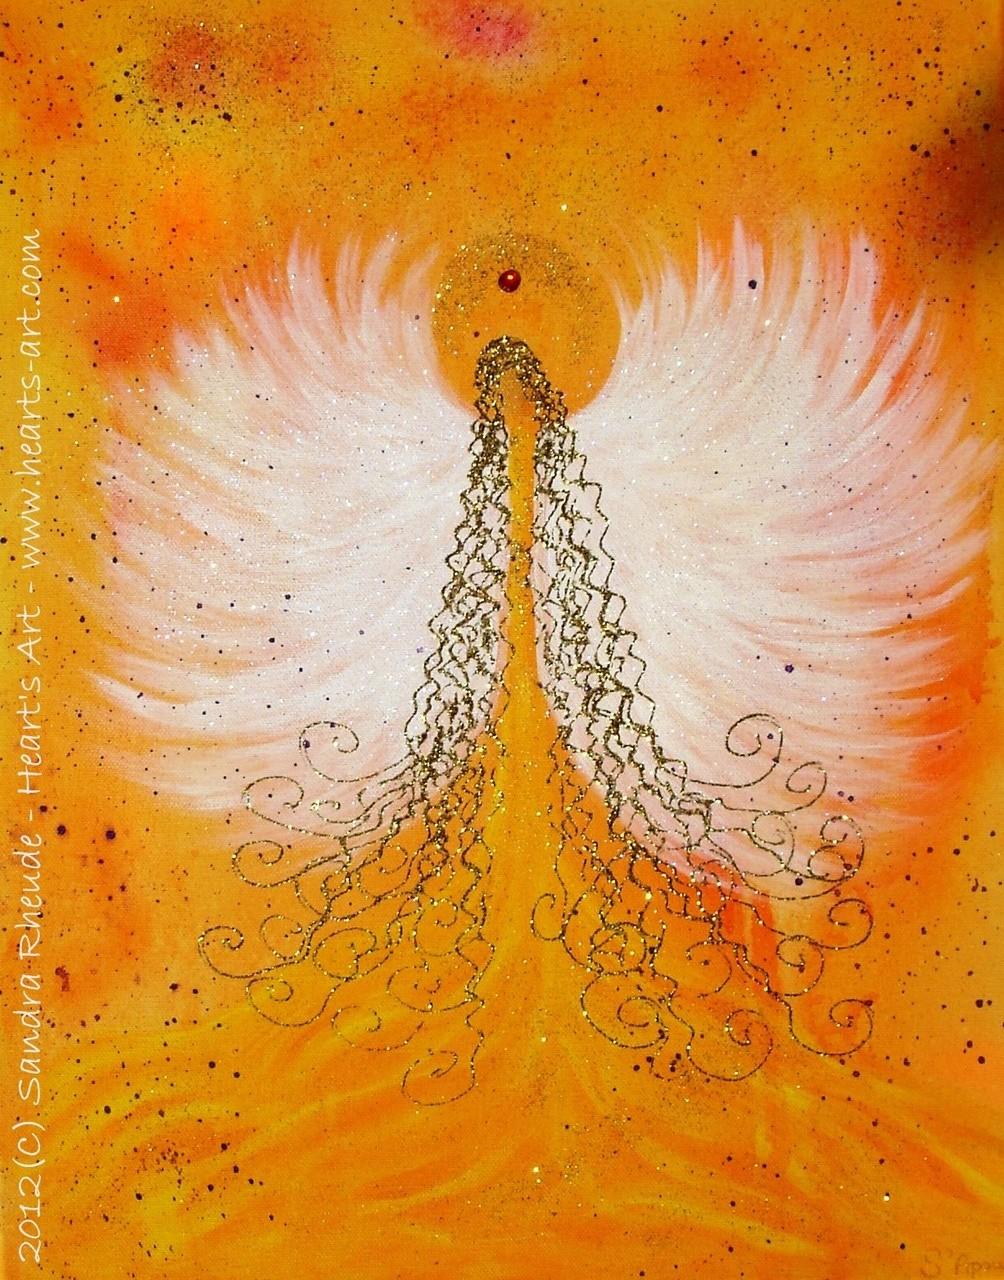 'Phoenix Angel' - 2012/64 - Acryl auf Leinwand - 40 x 50 cm - verkauft